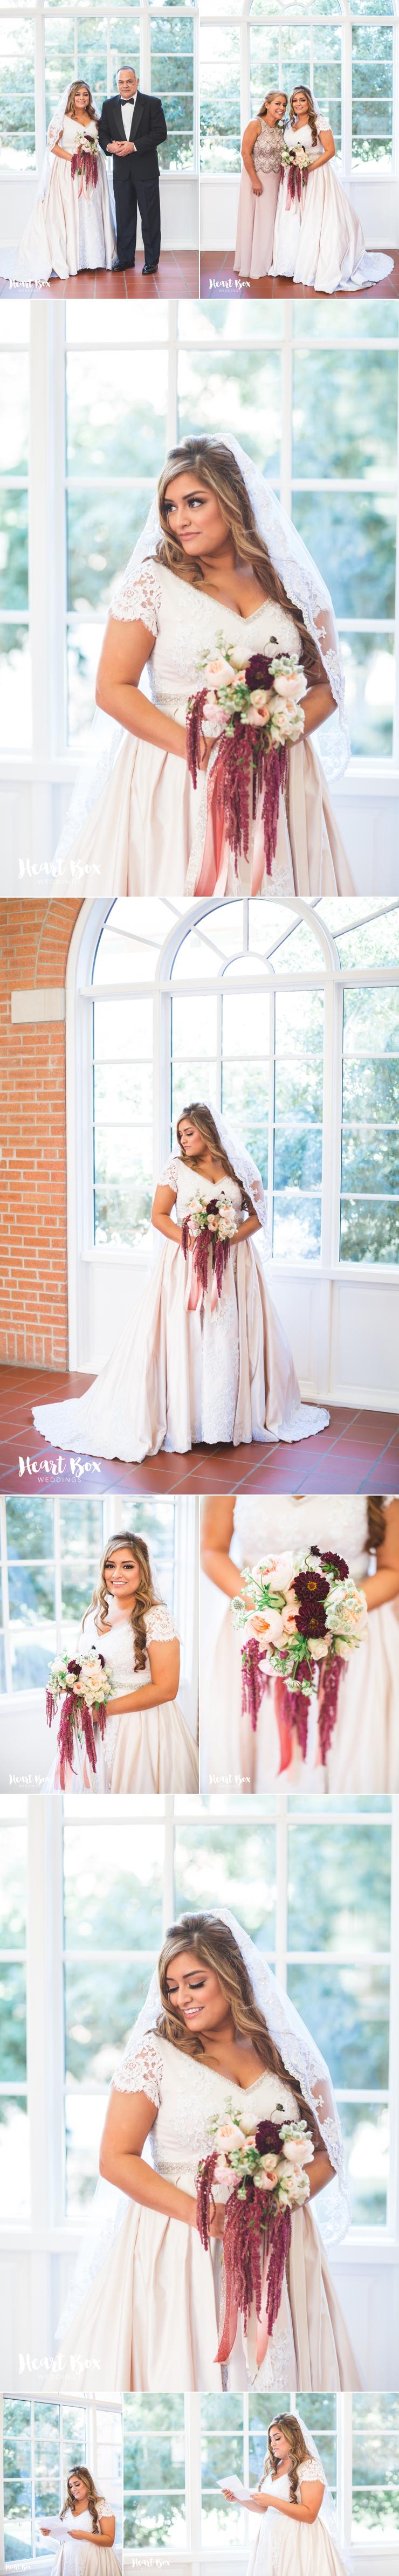 Montero Wedding BC 6.jpg